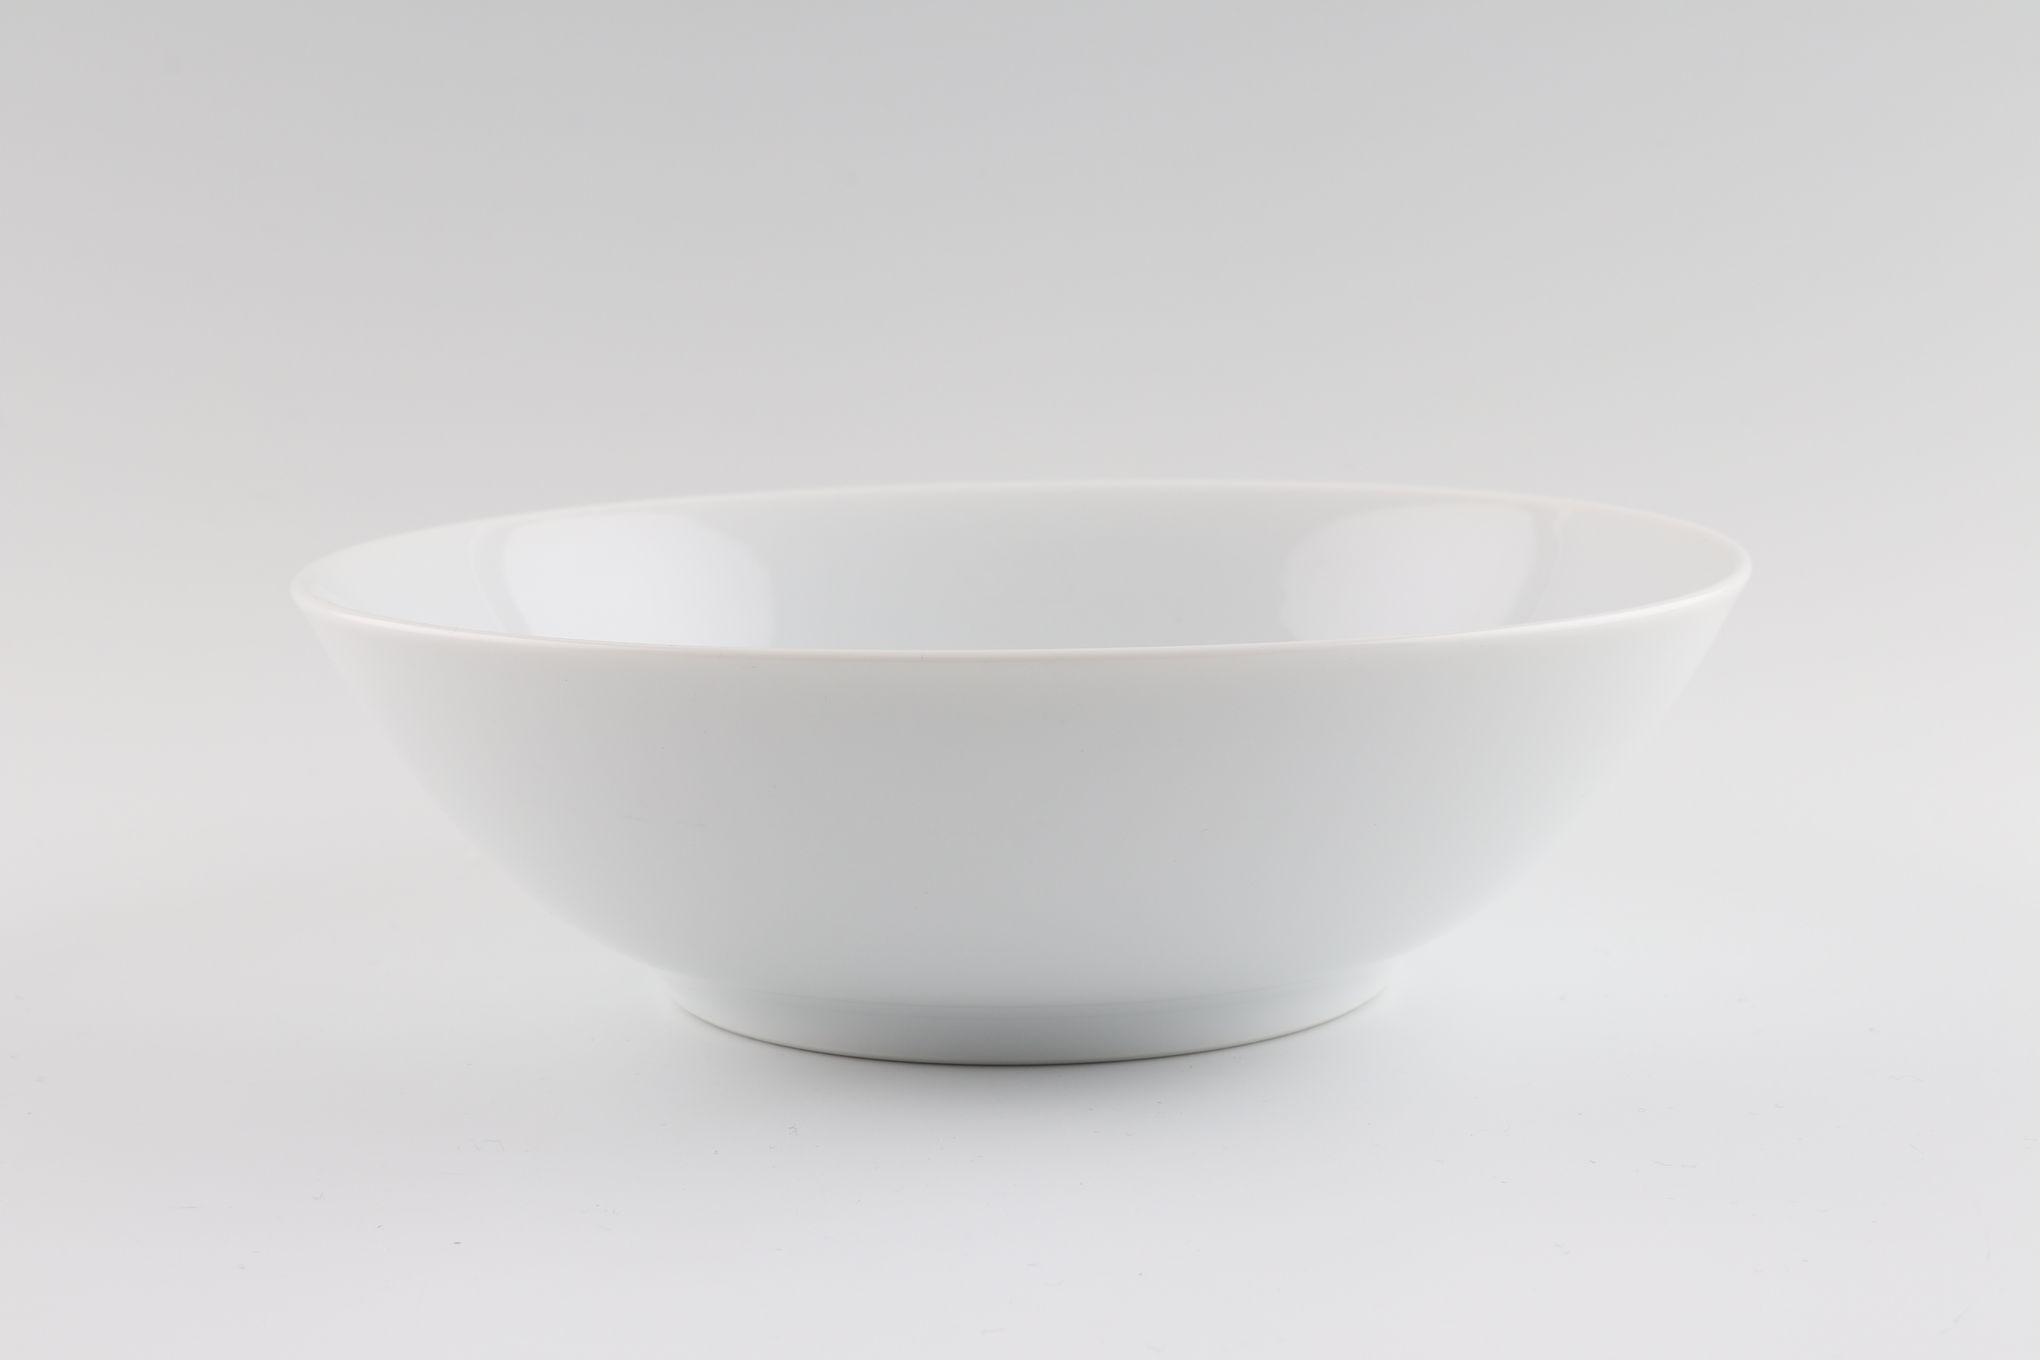 "Noritake Bahama Soup / Cereal Bowl 6 1/2"" thumb 1"